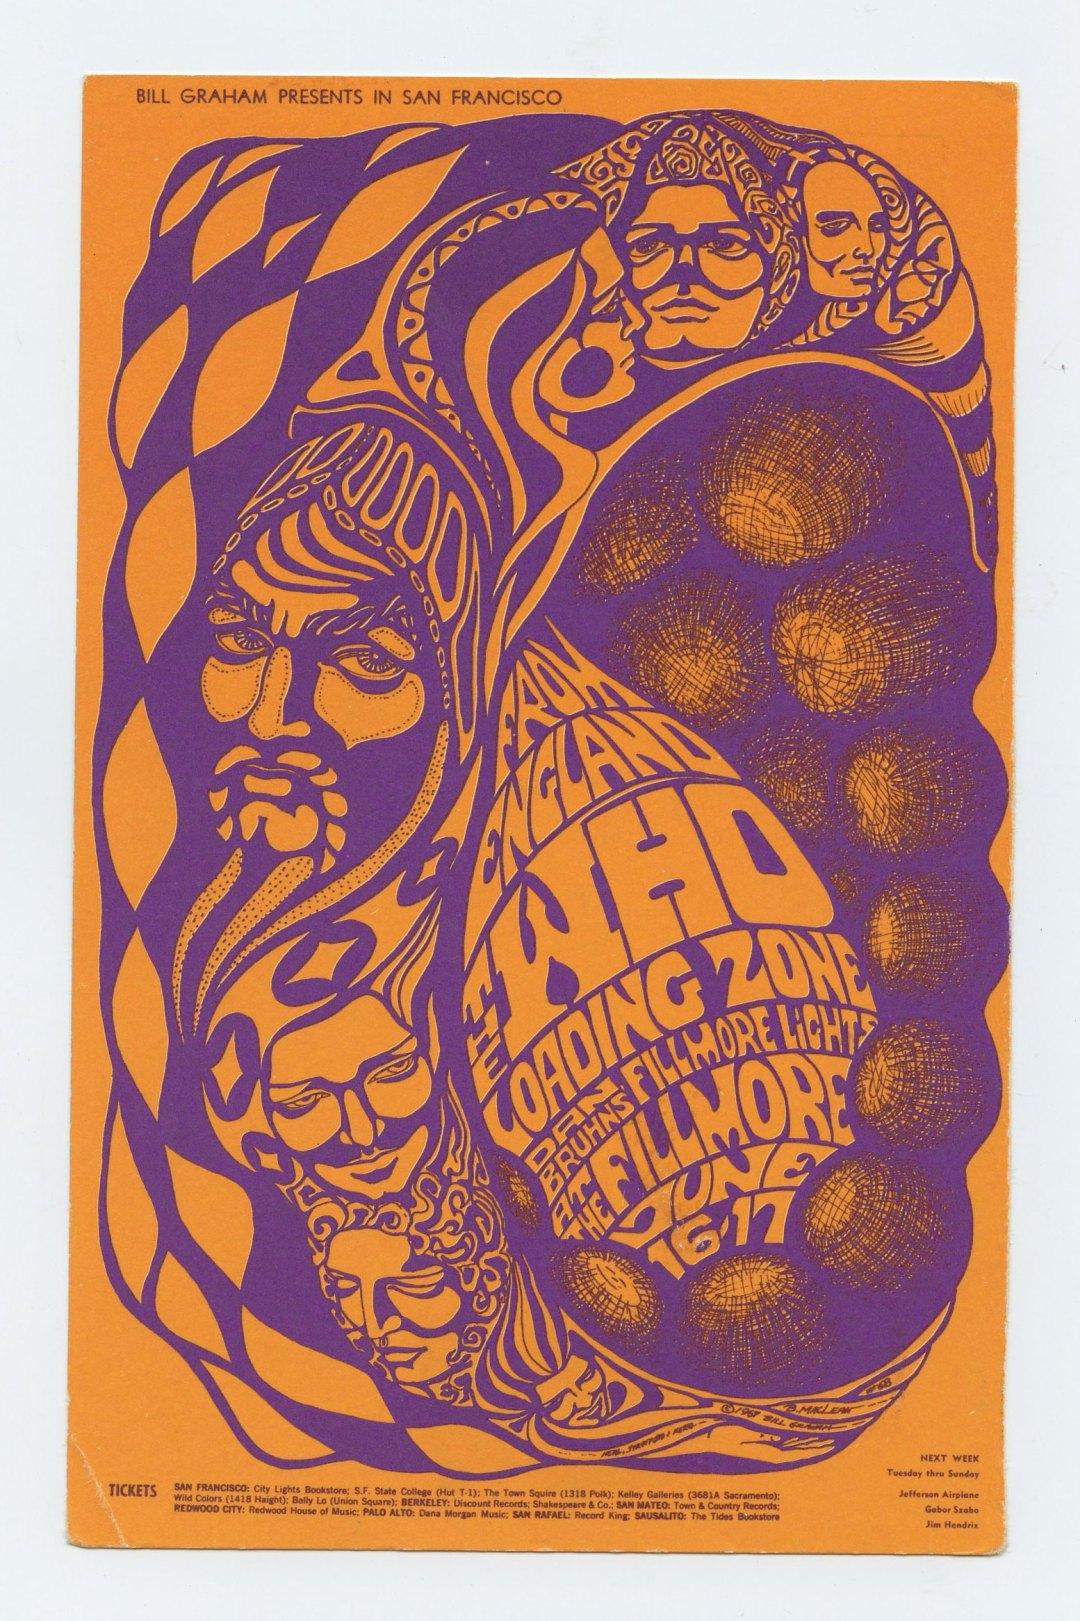 BG 68 Postcard Mailed The Who Loading Zone 1967 Jun 16